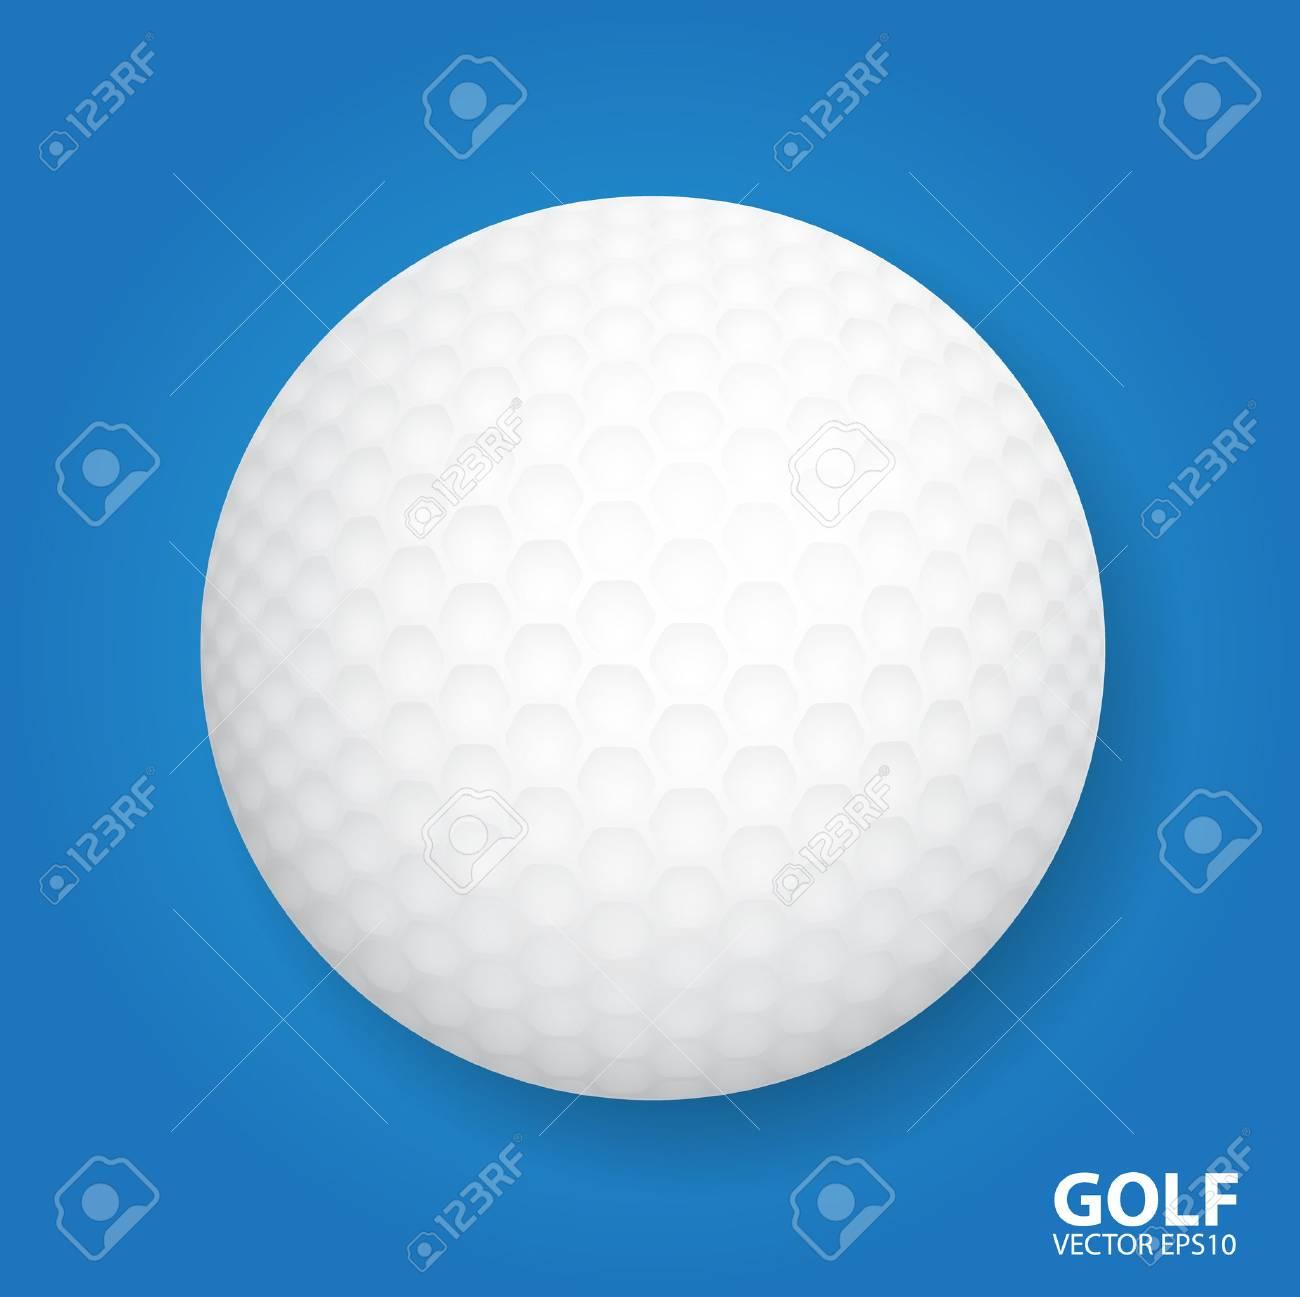 golf ball vector illustration royalty free cliparts vectors and